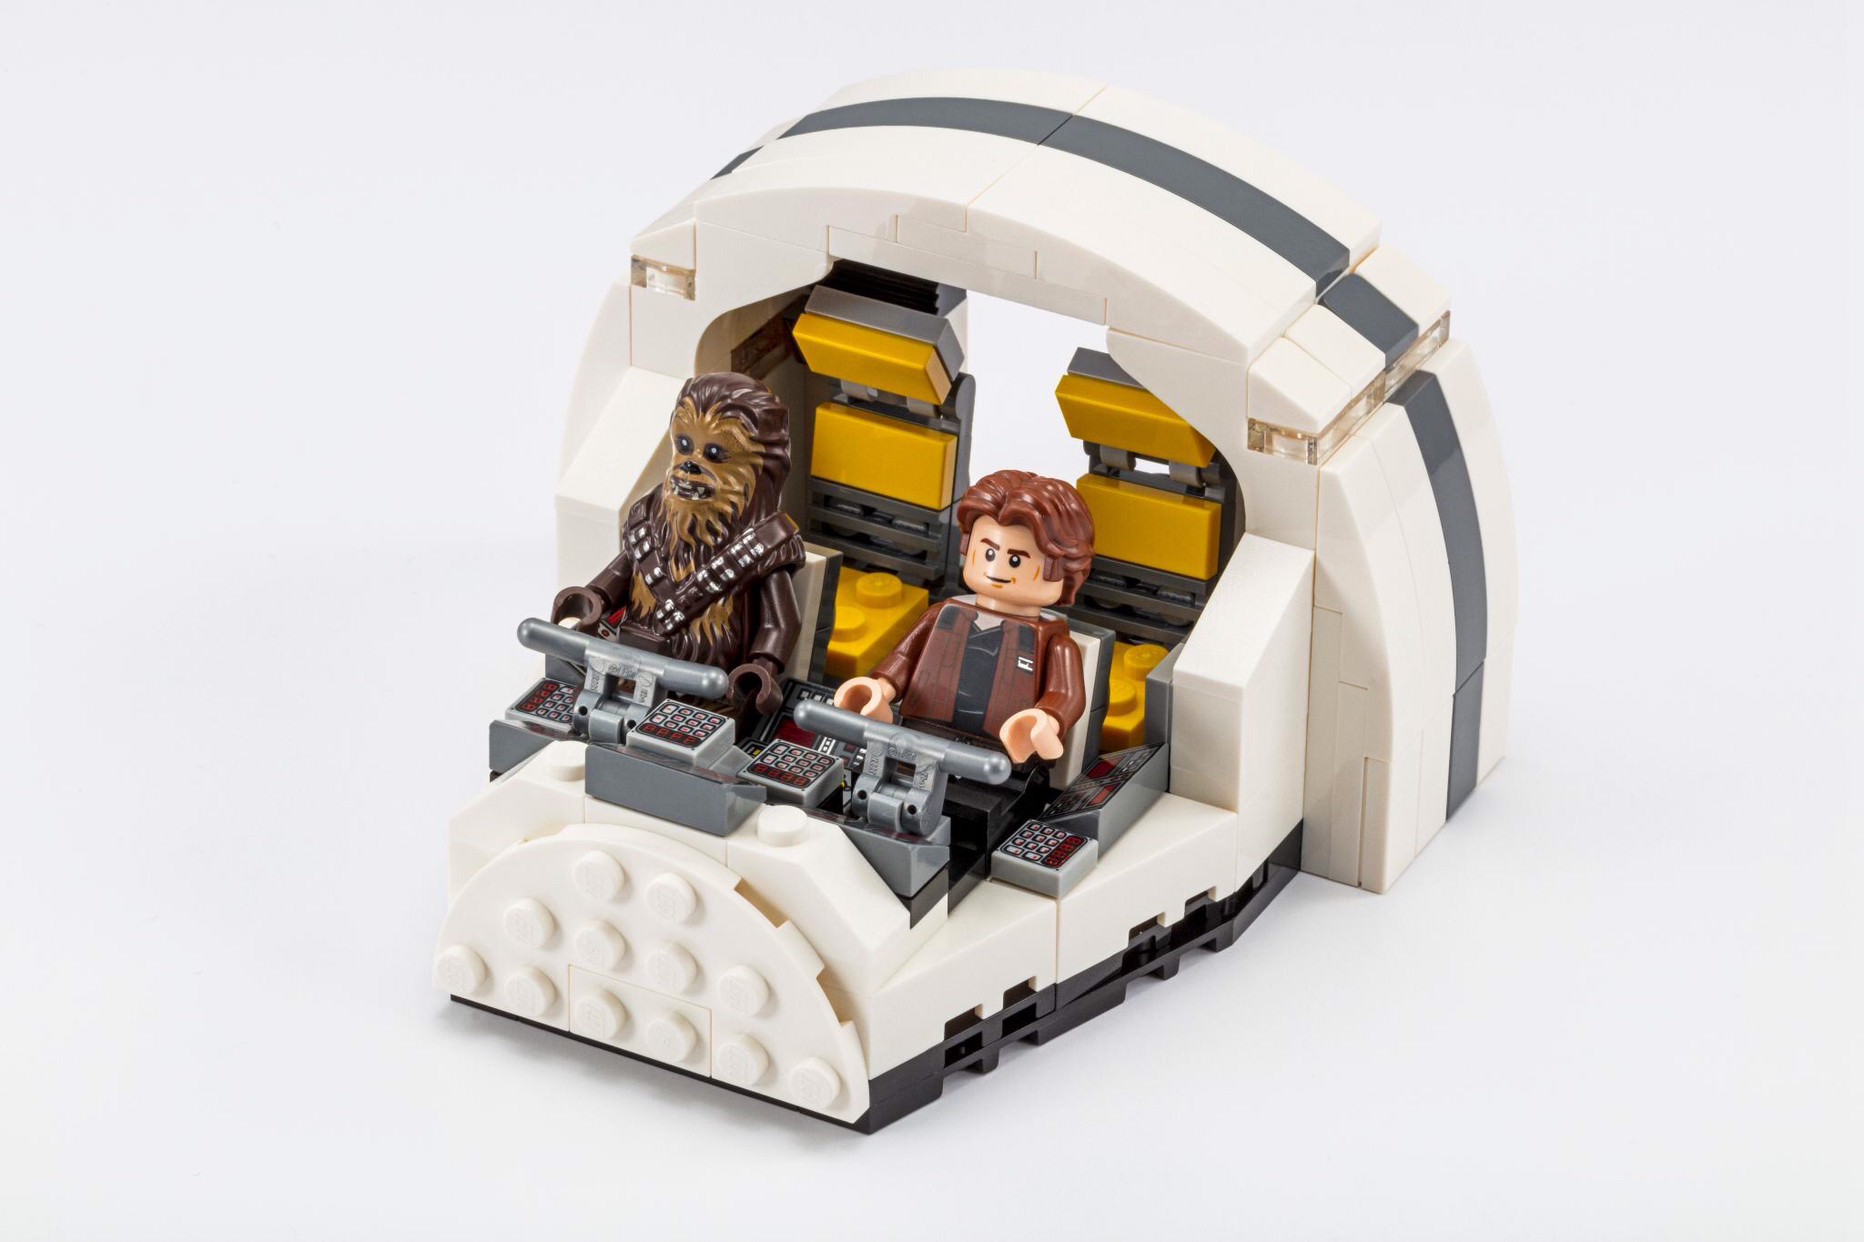 LEGO Star Wars 75512 Millennium Falcon Cockpit exclu SDCC